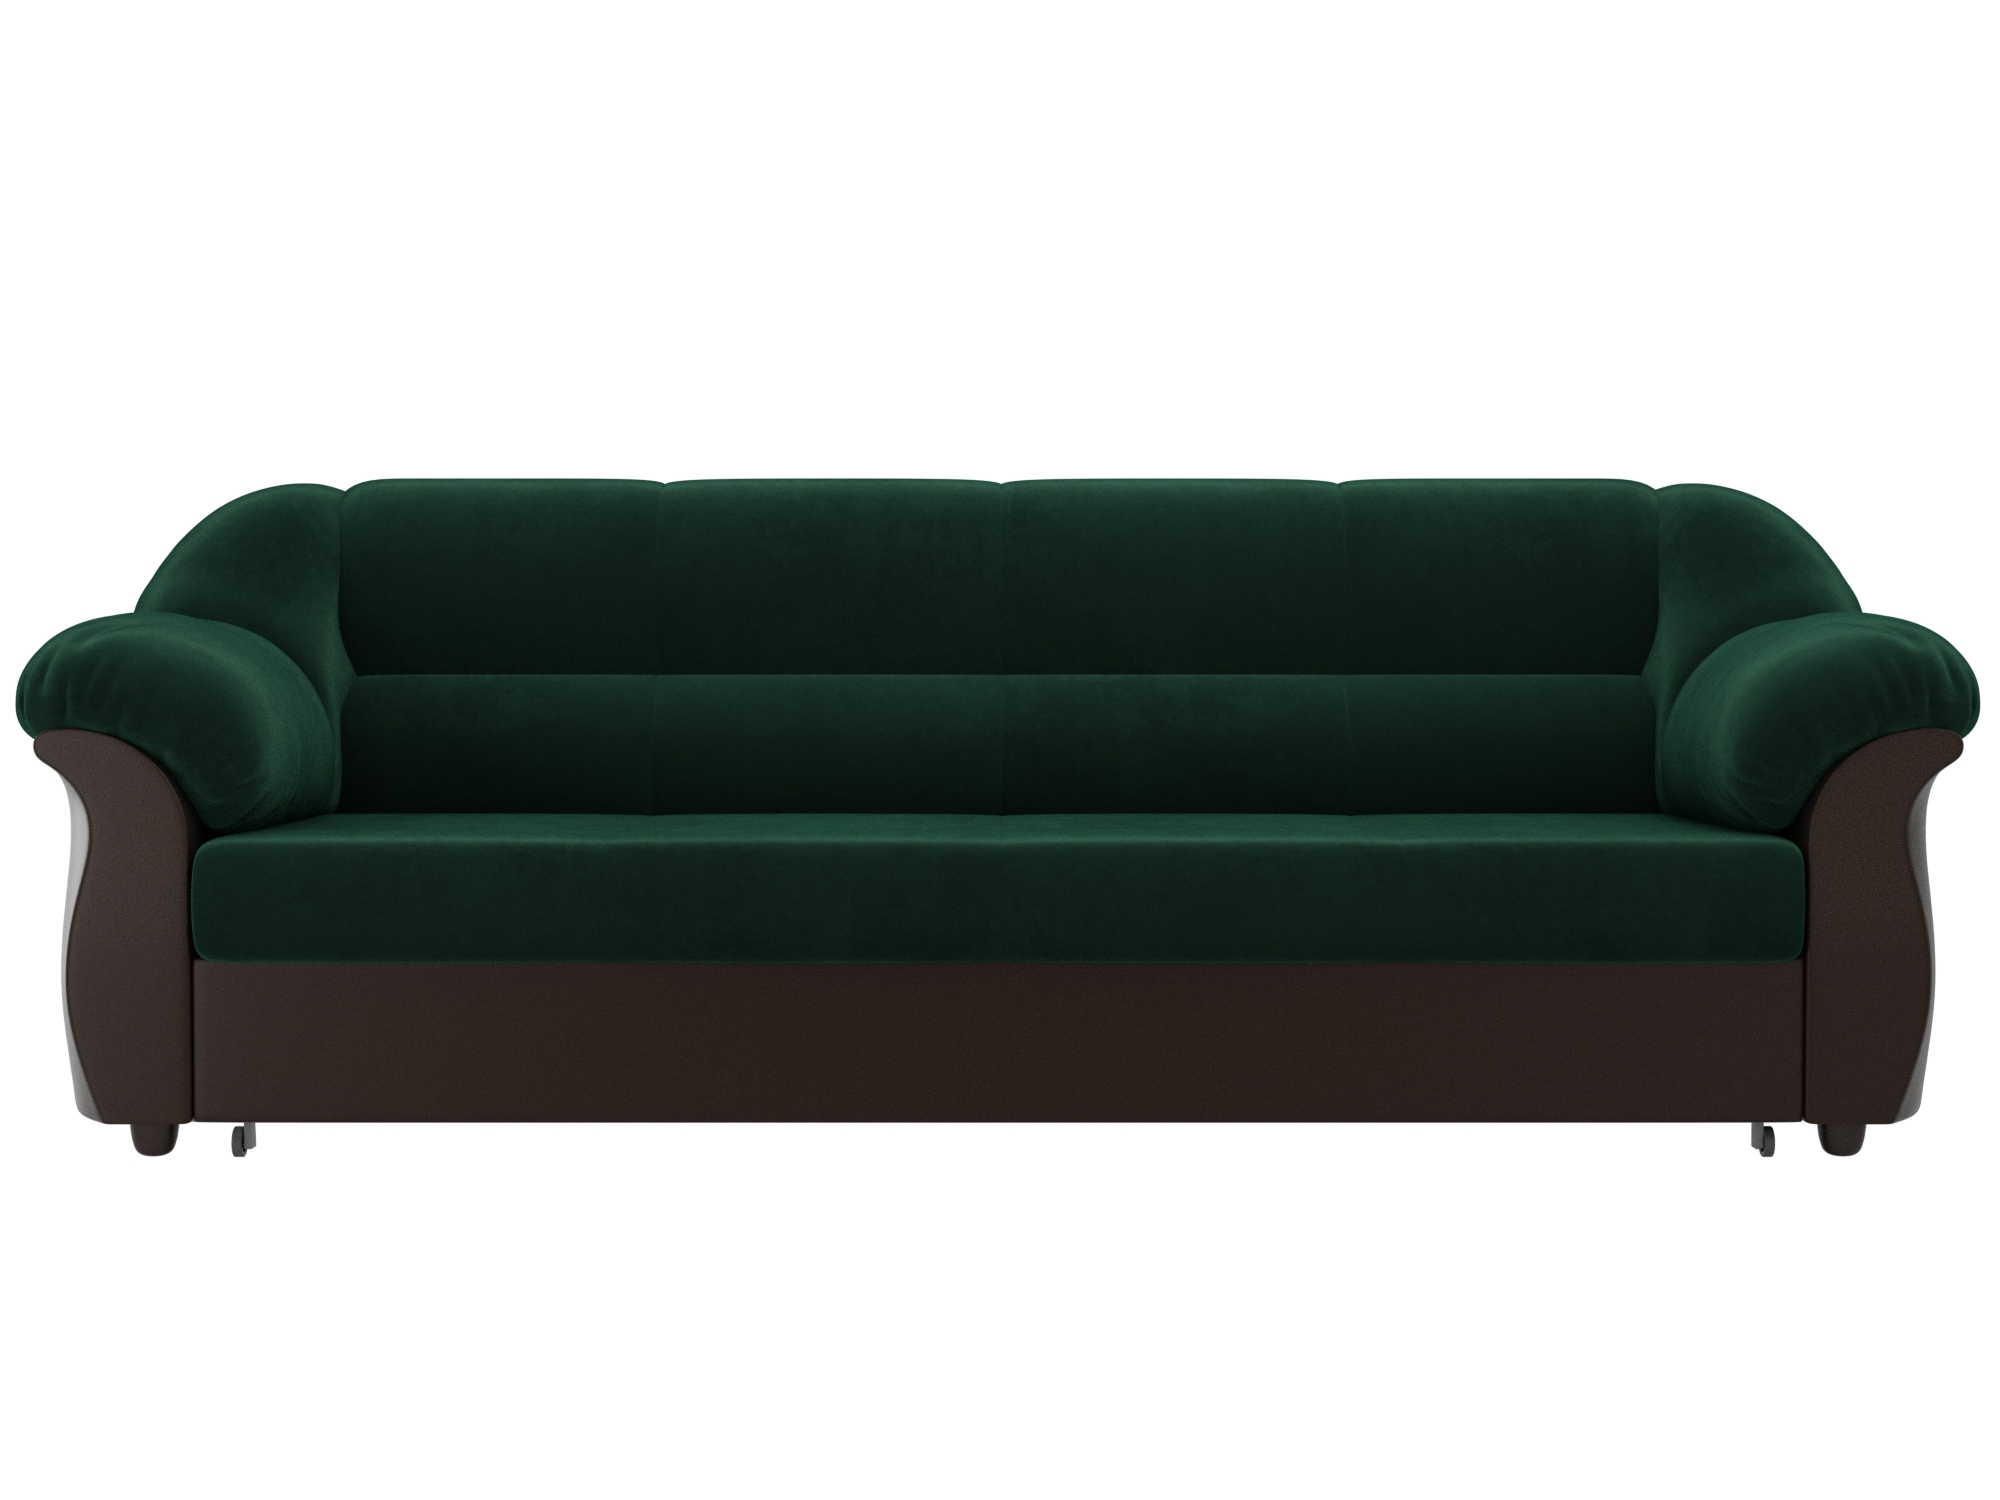 Диван Карнелла MebelVia Зеленый, Коричневый